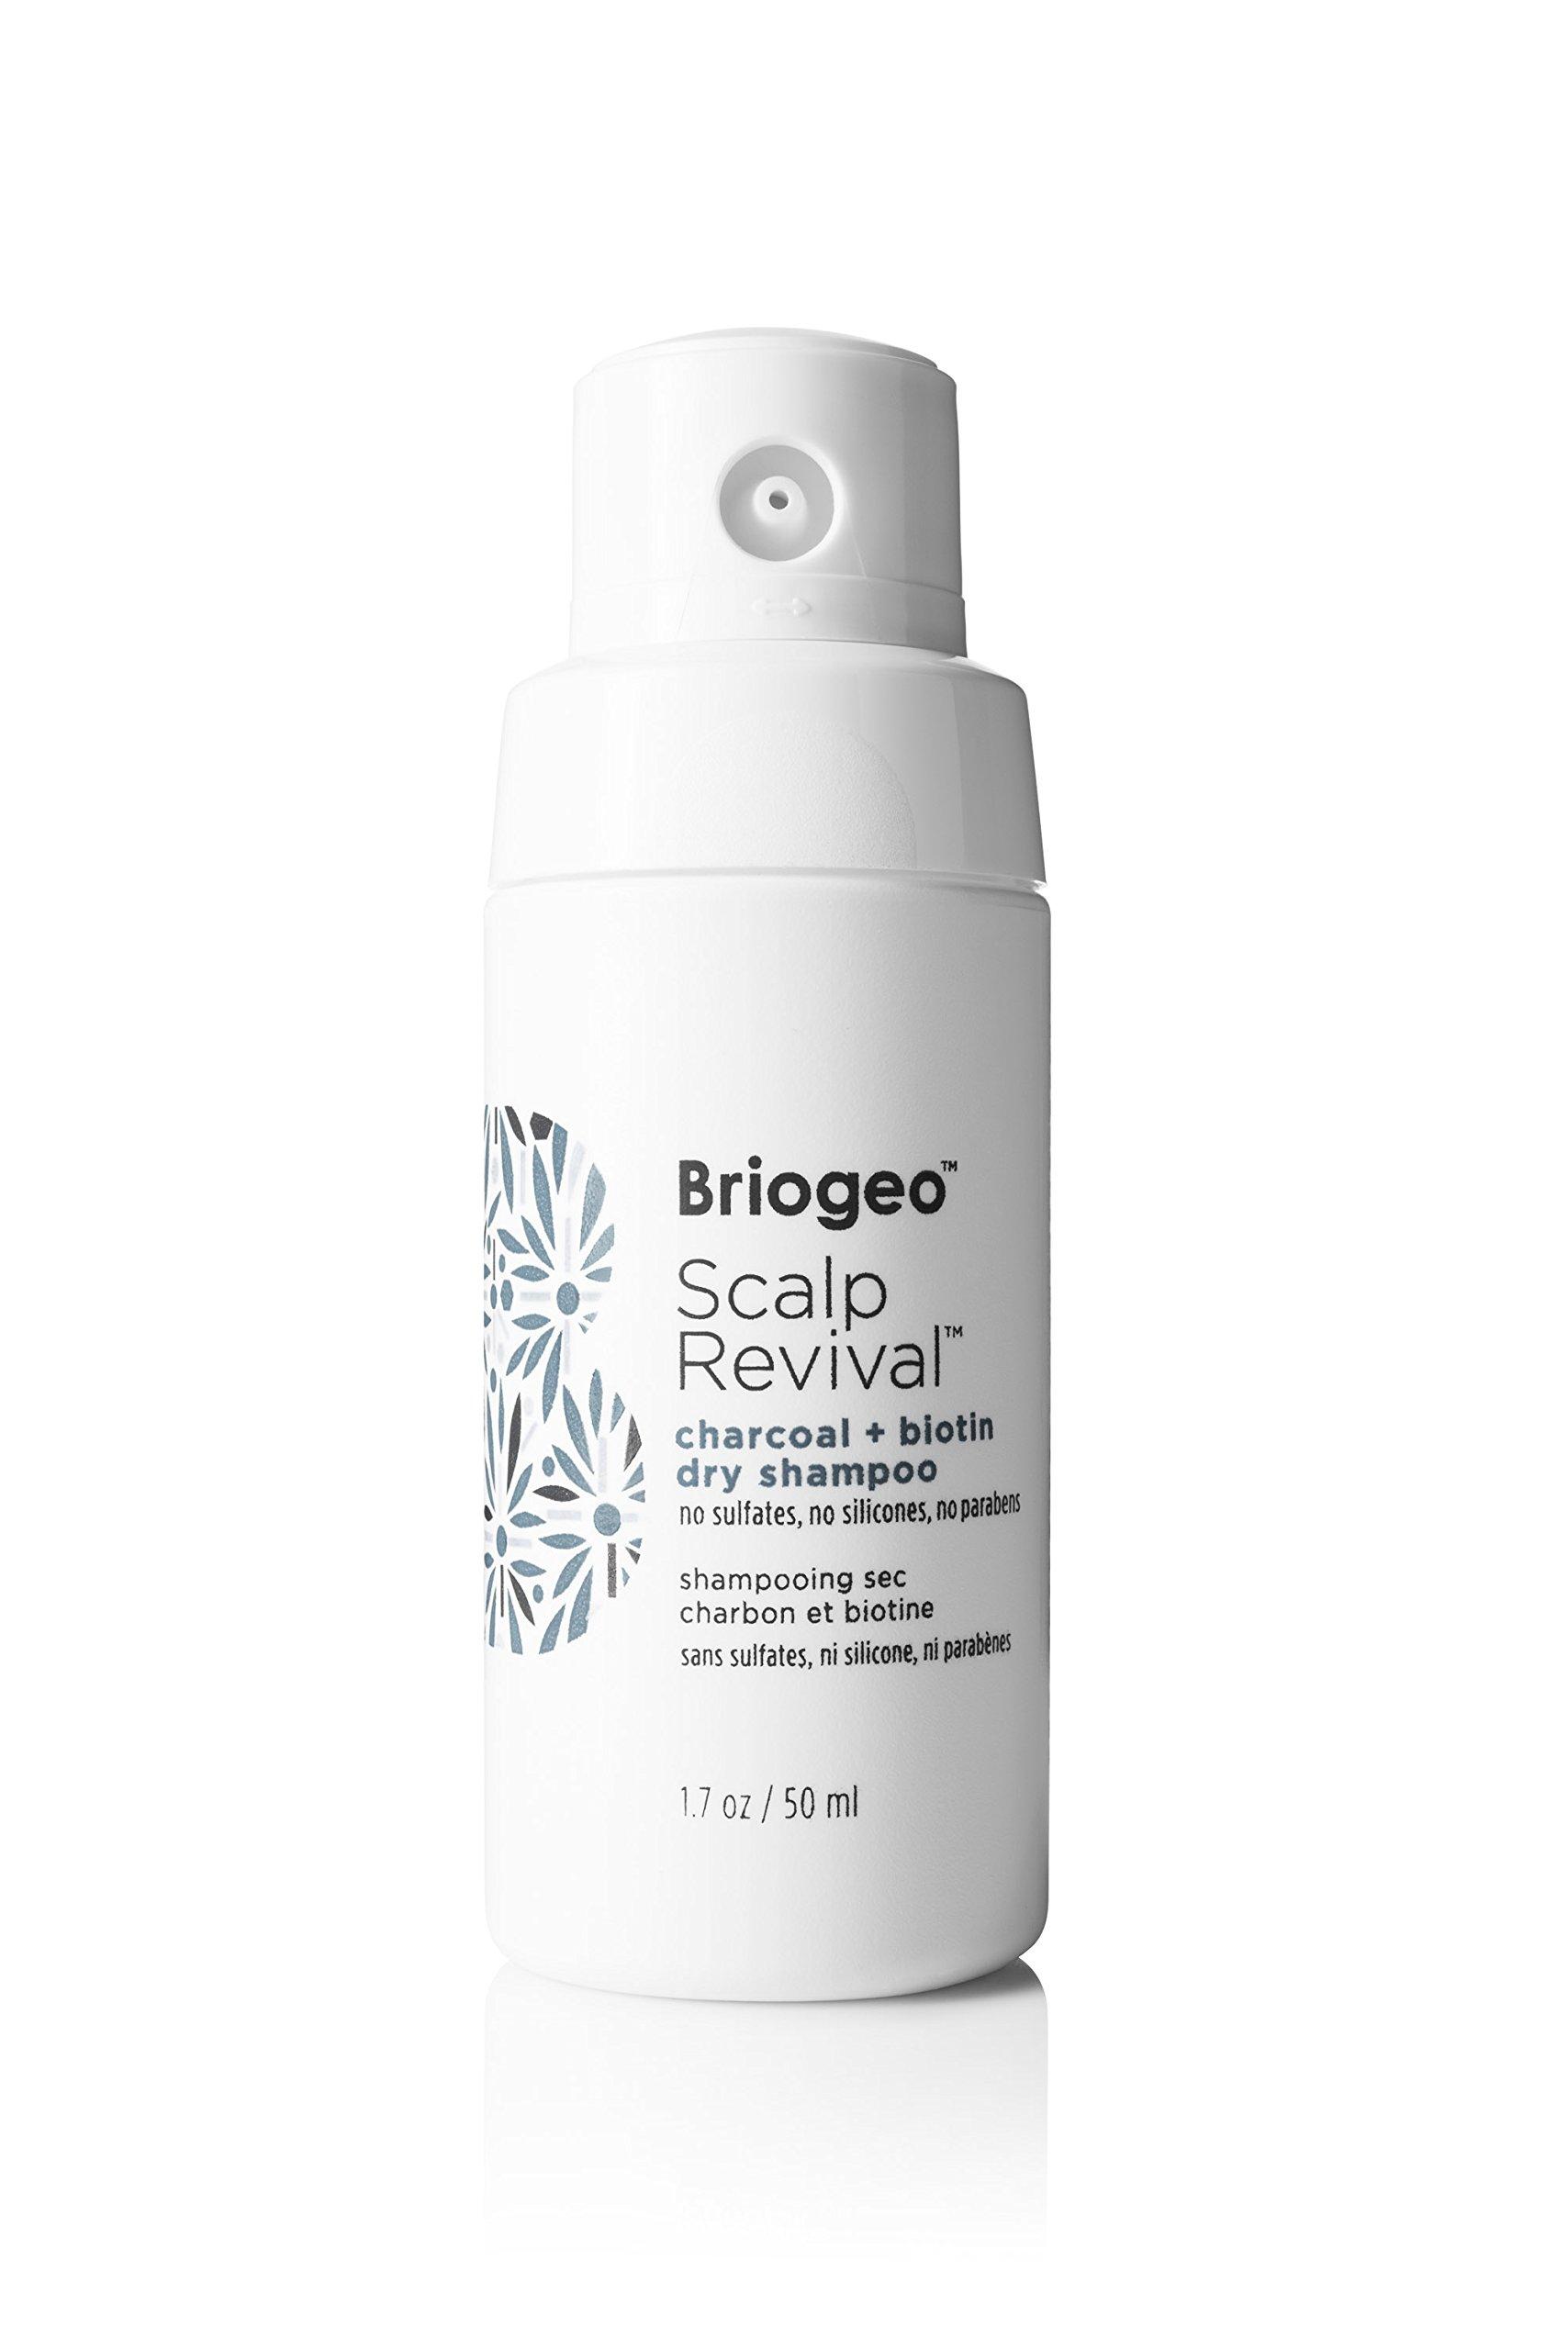 Briogeo Scalp Revival Charcoal Biotin Dry Shampoo,1.7 Ounces